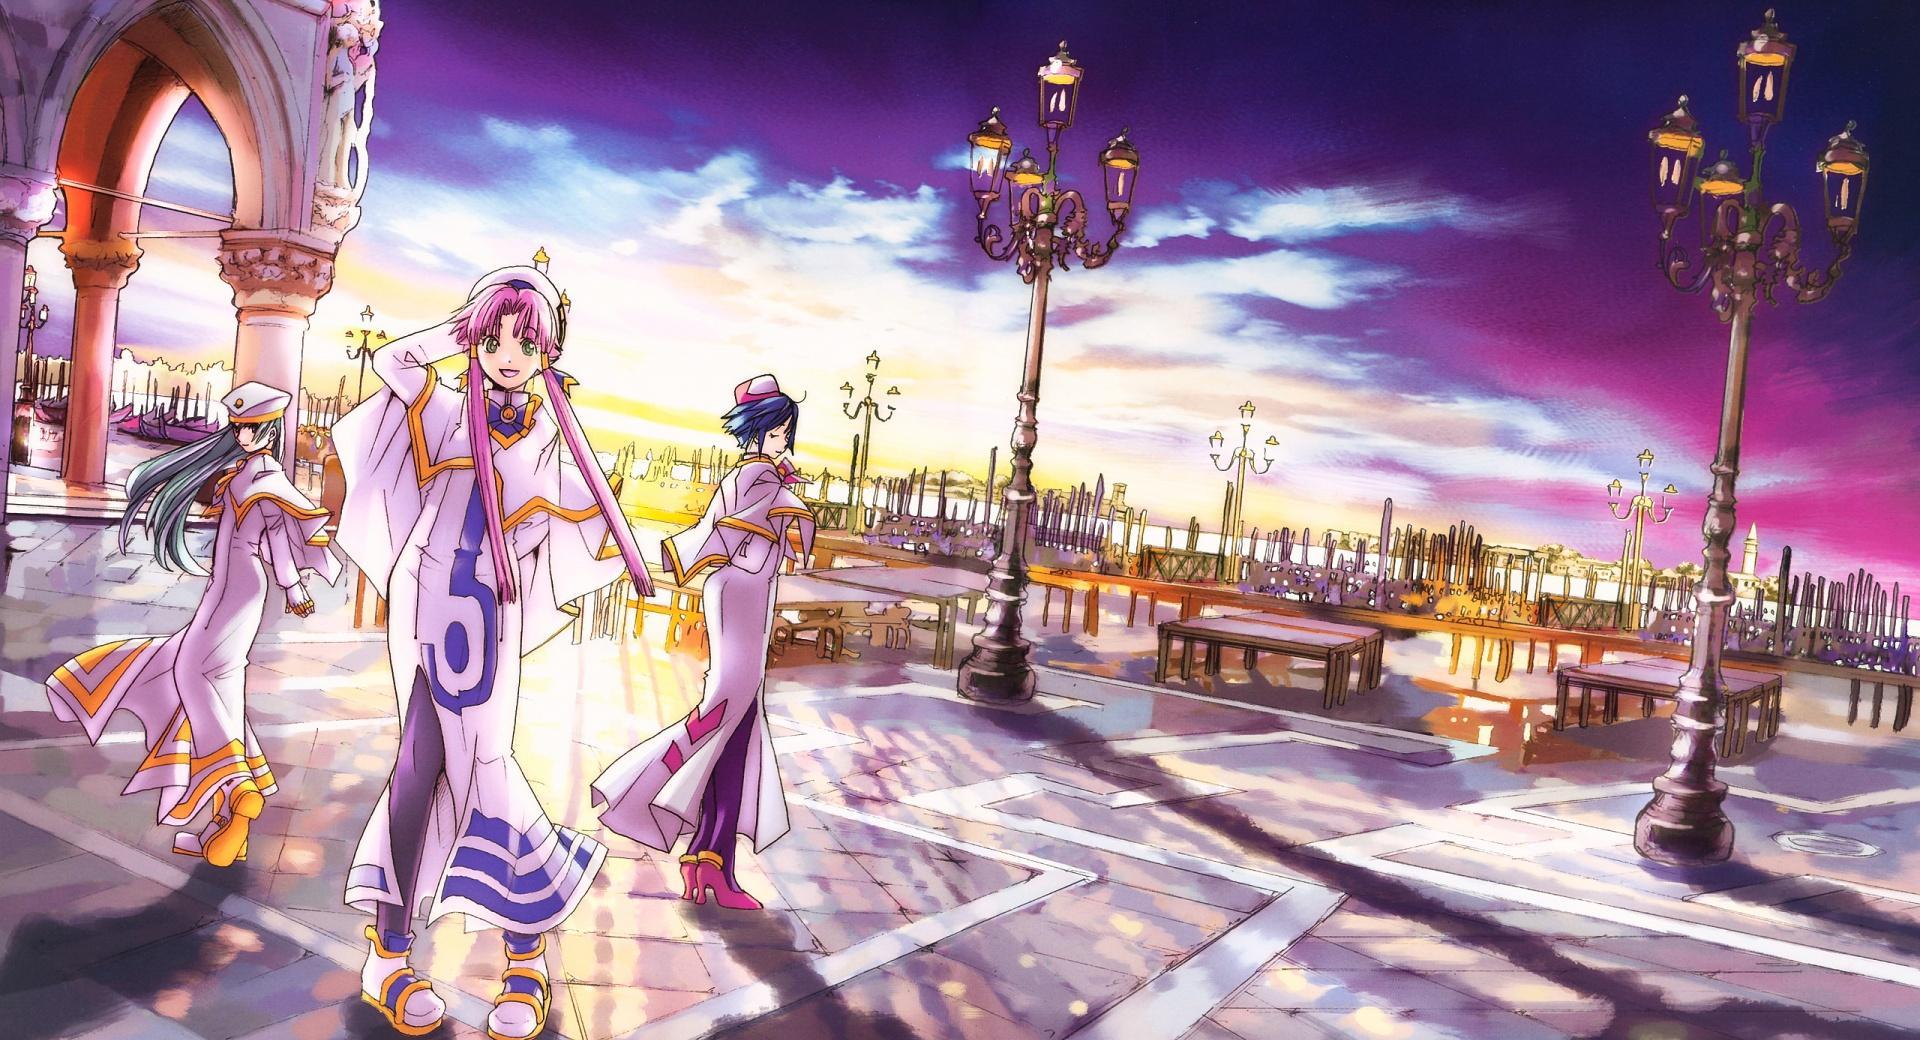 Aria Fantasy Manga at 1024 x 1024 iPad size wallpapers HD quality